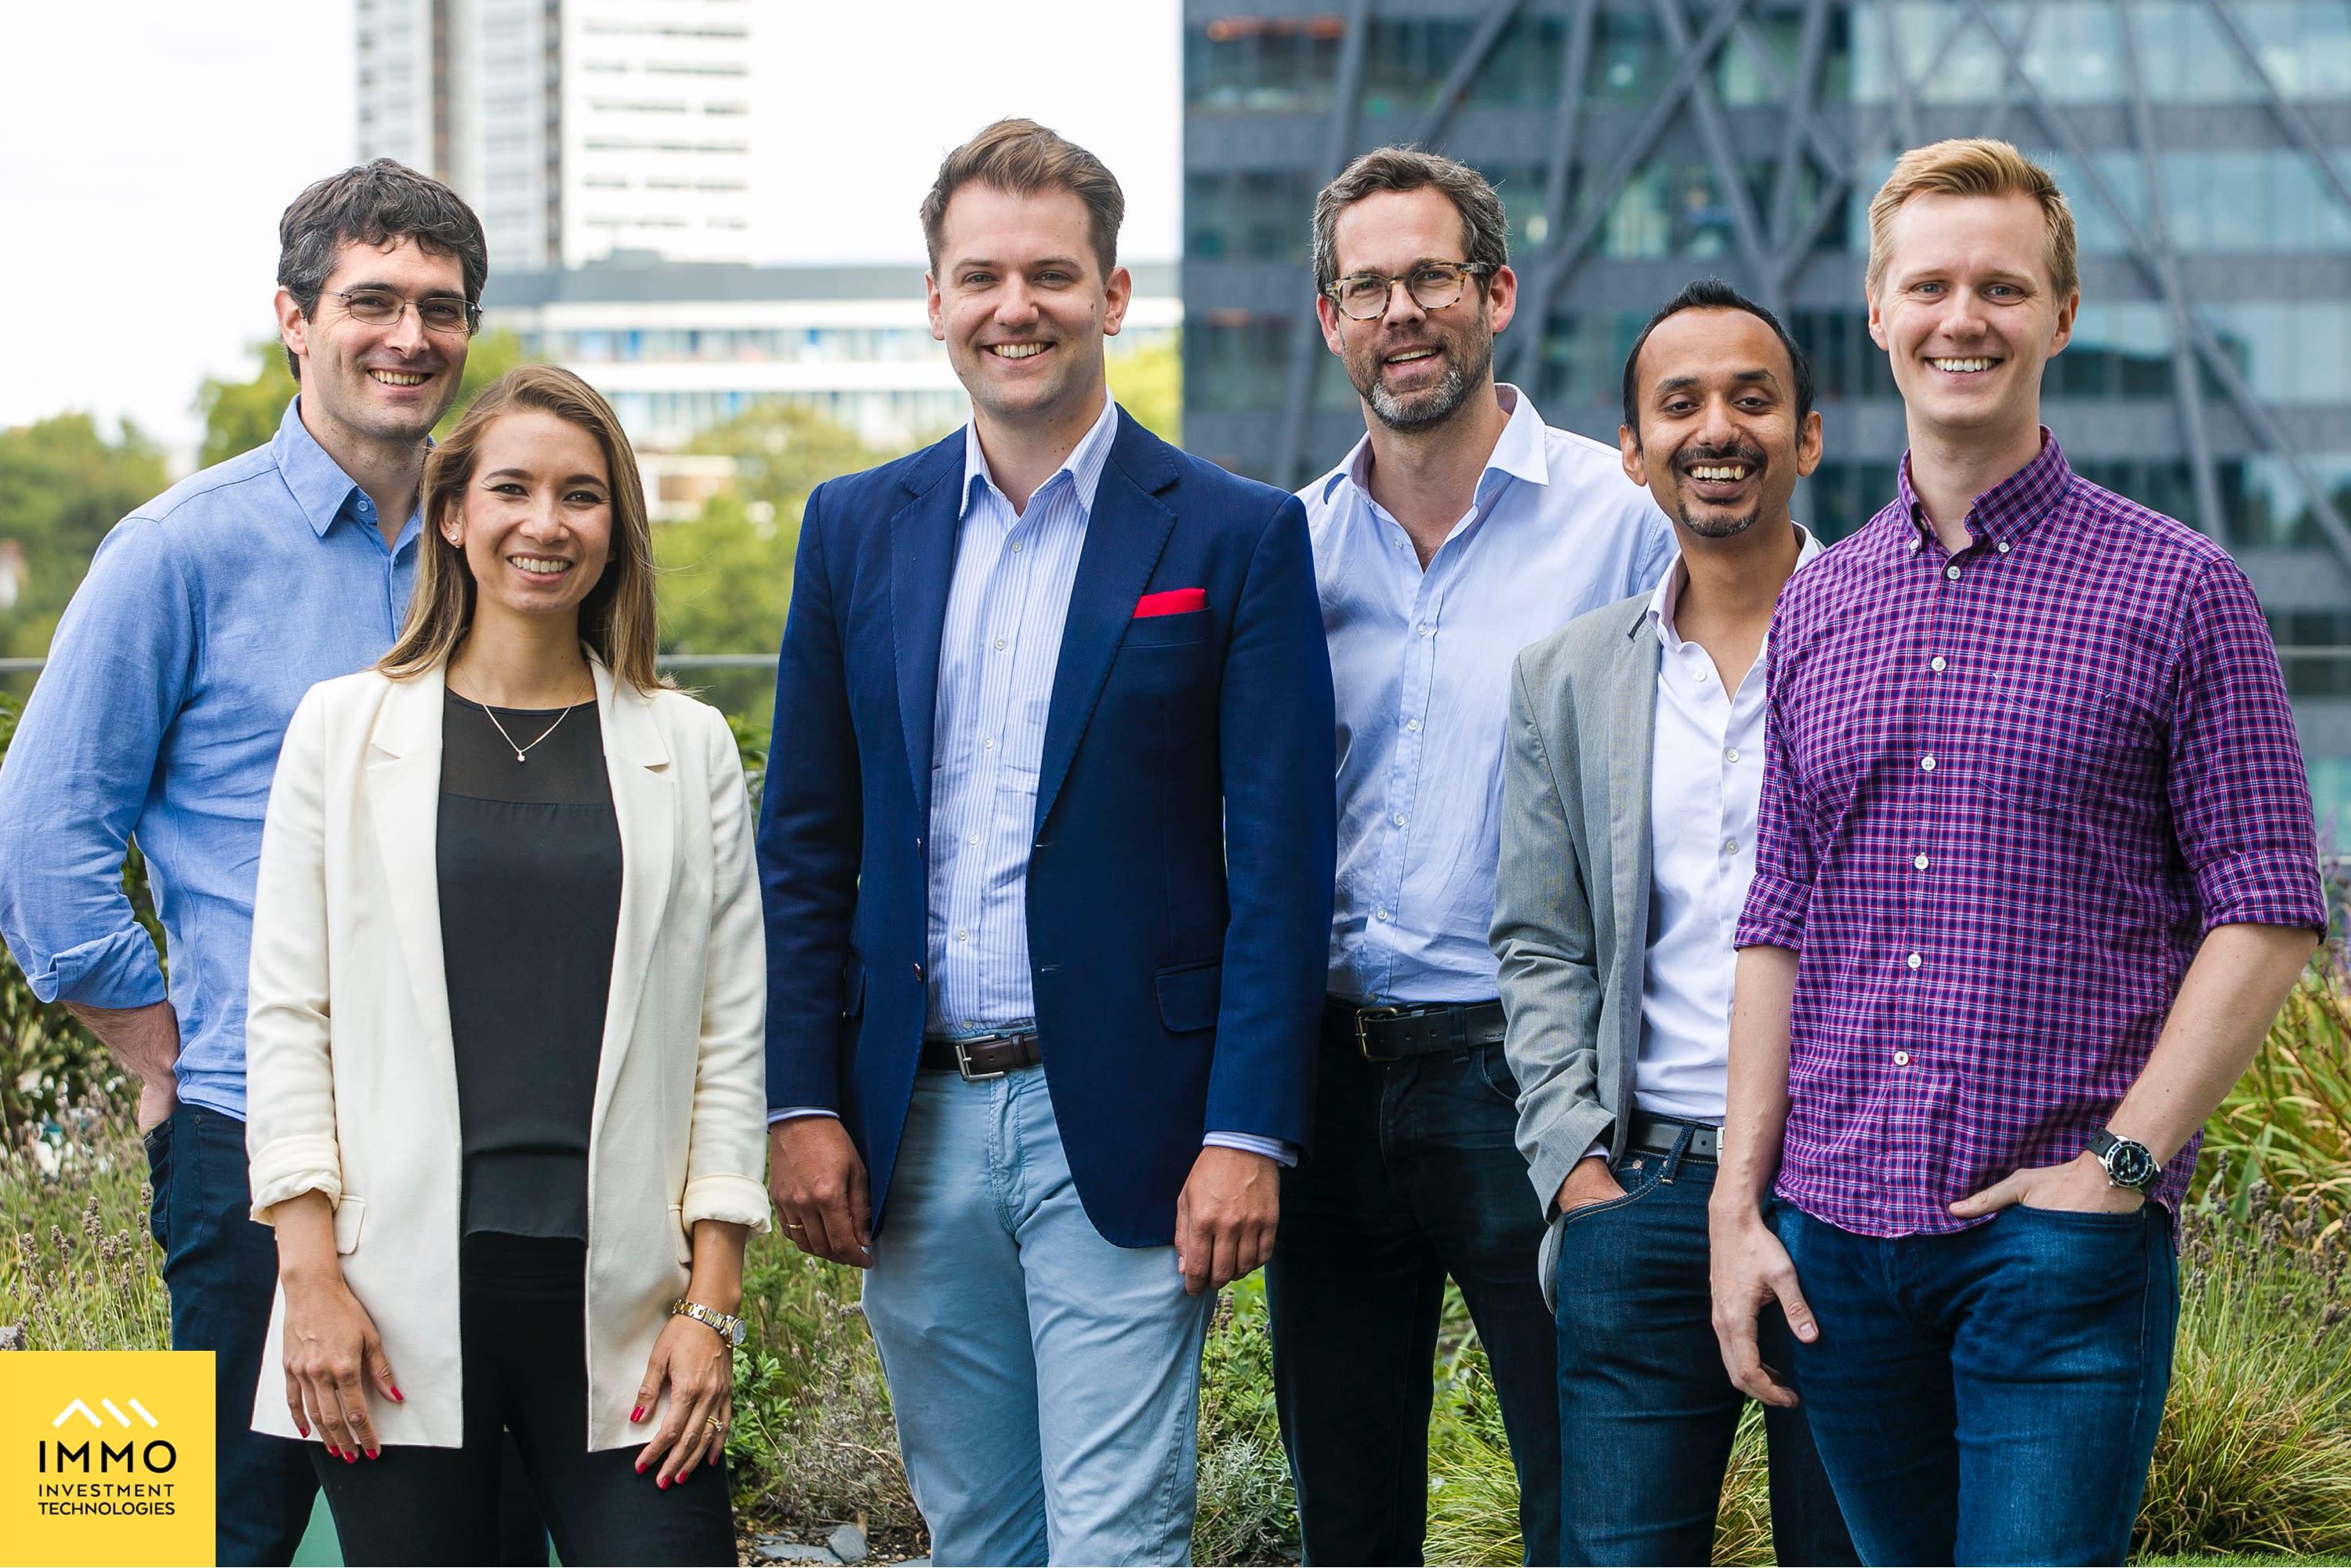 Real estate fintech platform Immo Investment Technologies raises €11M Series A